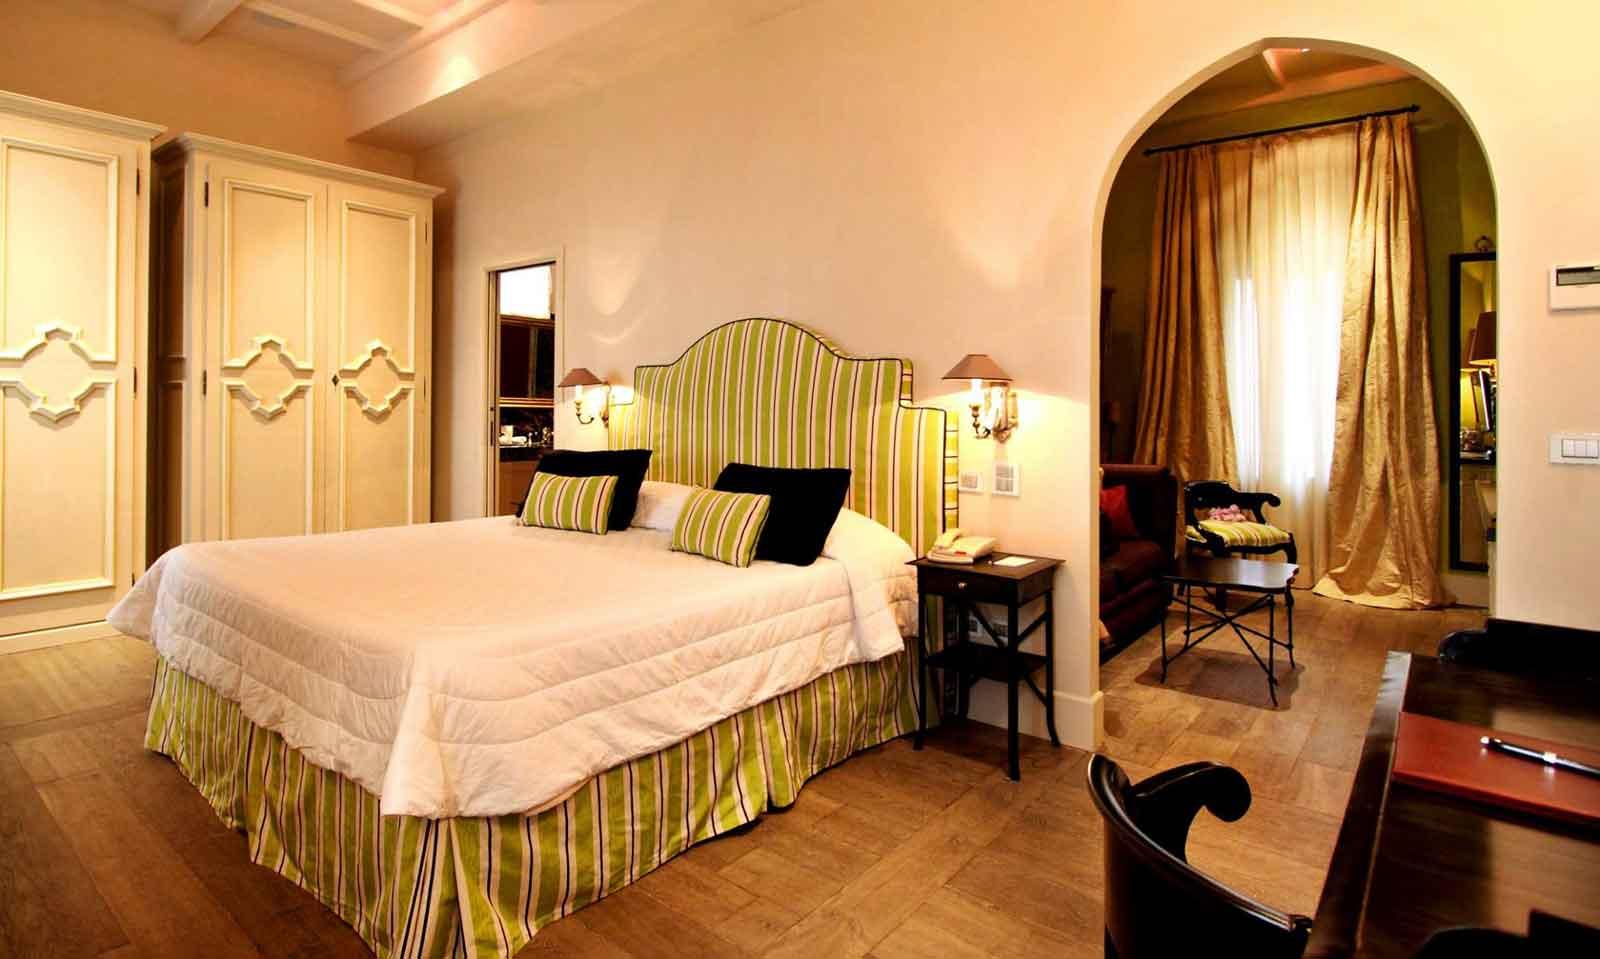 El Jebel Boutique Hotel Taormina, Sicile Italie (chambre)